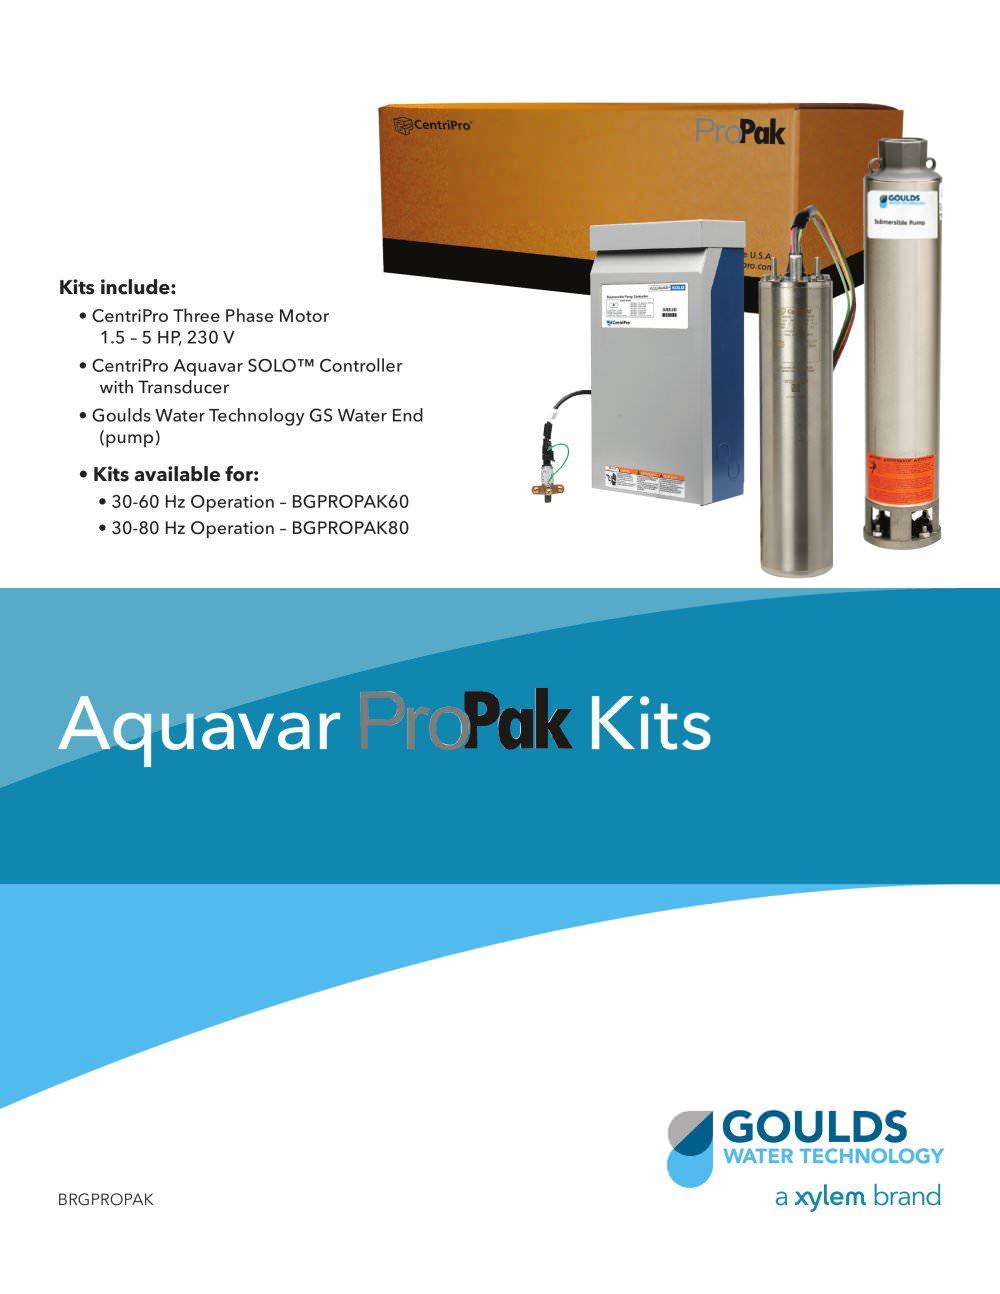 Brgpropak Aquavar Propak Kits Goulds Pumps Pdf Catalogue Centripro Pump Control Wiring Diagram 1 4 Pages